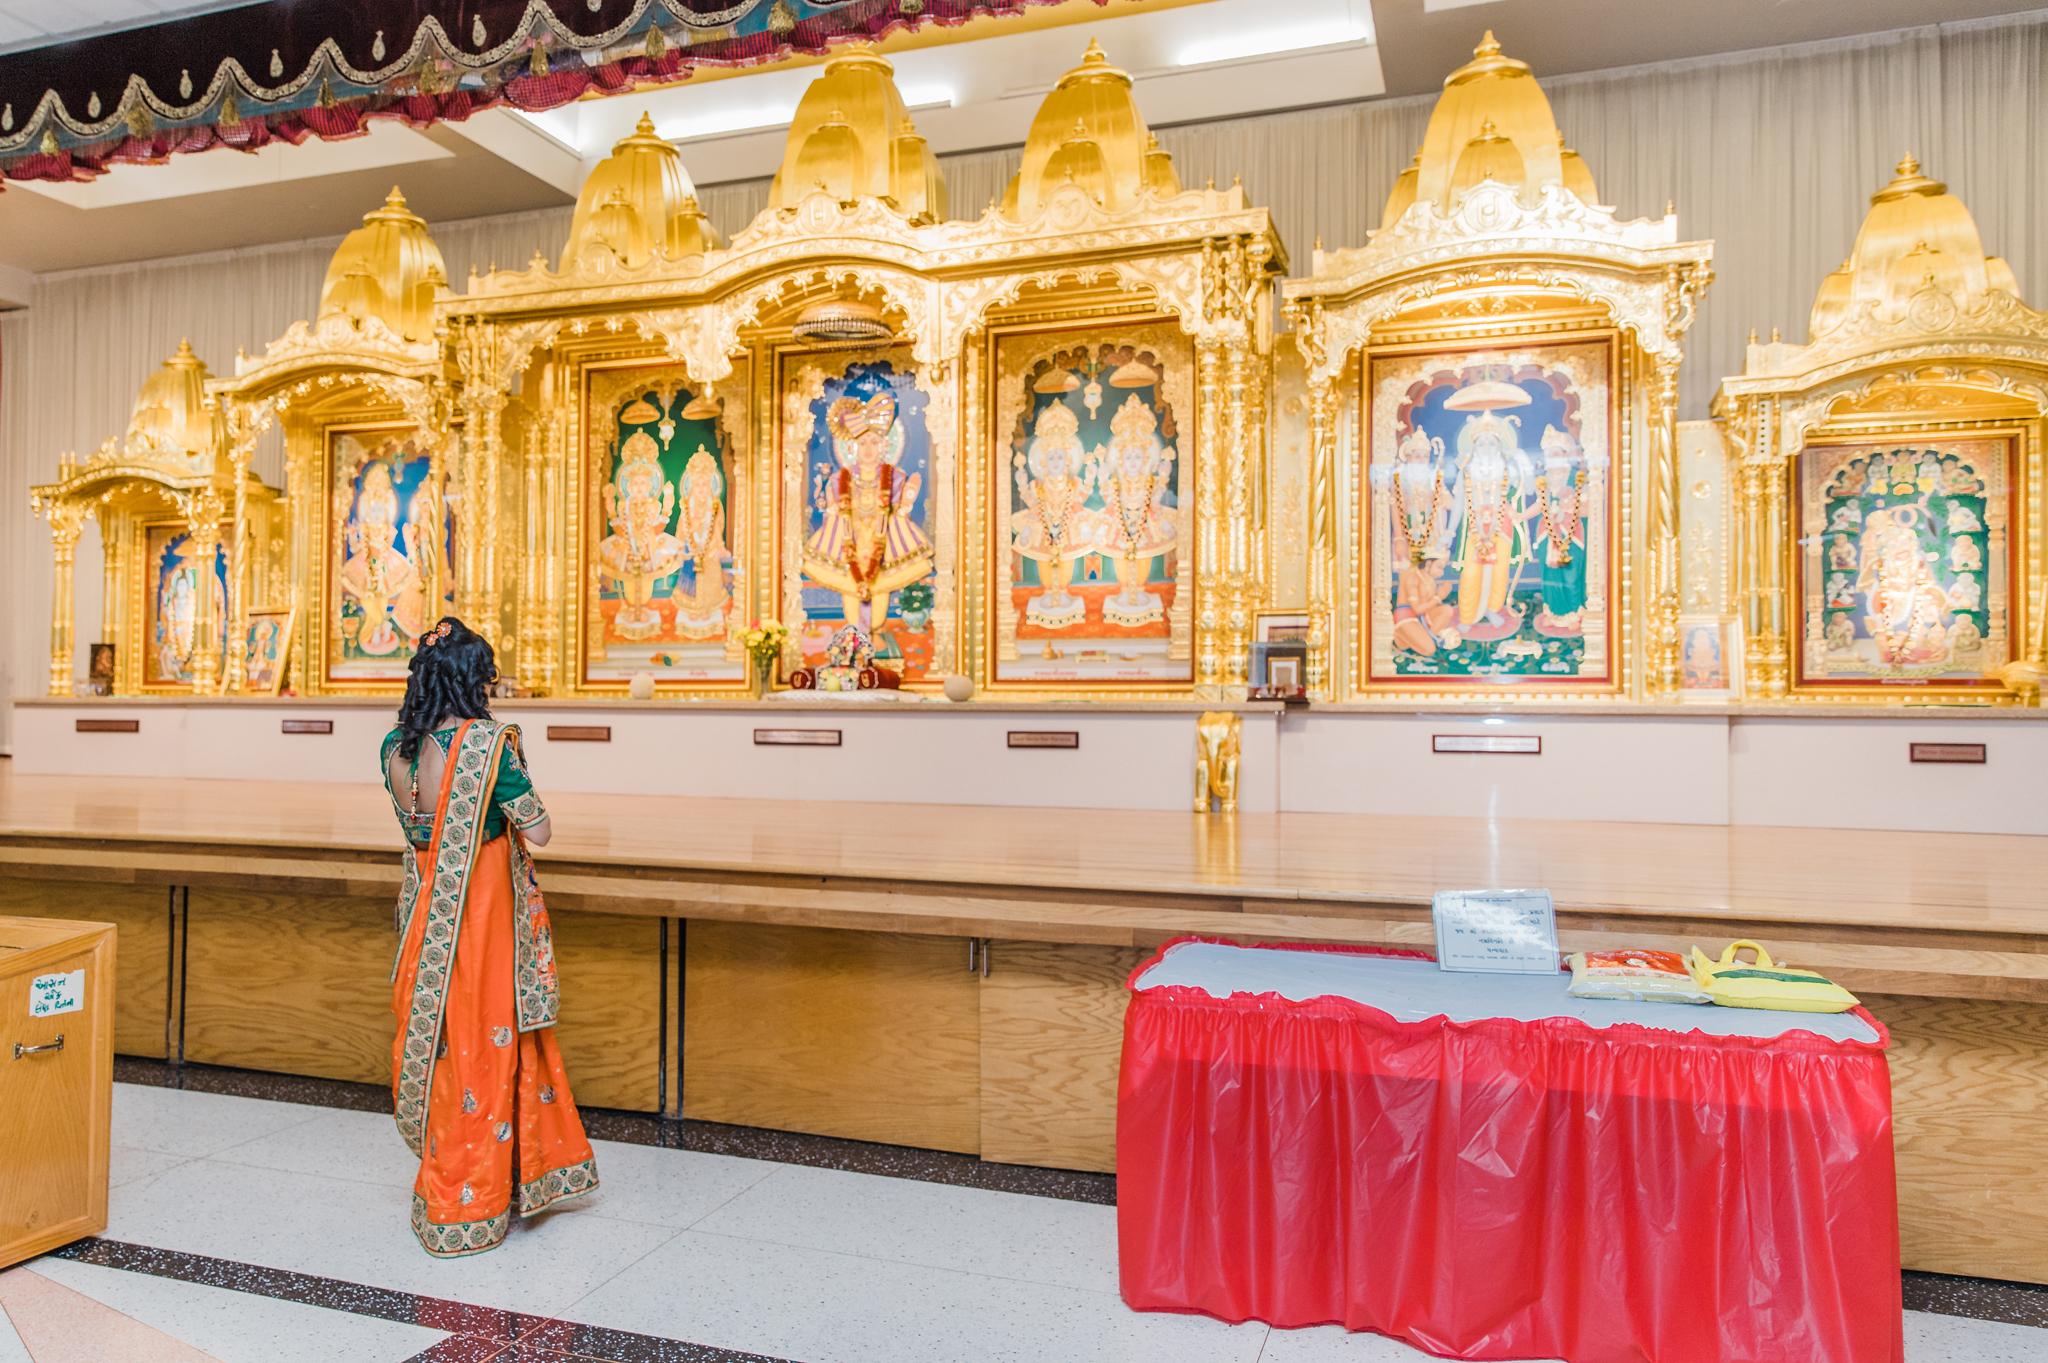 Shri Swaminarayan Mandir Chicago Wheeling Swaminarayan Temple Vadtal of USA